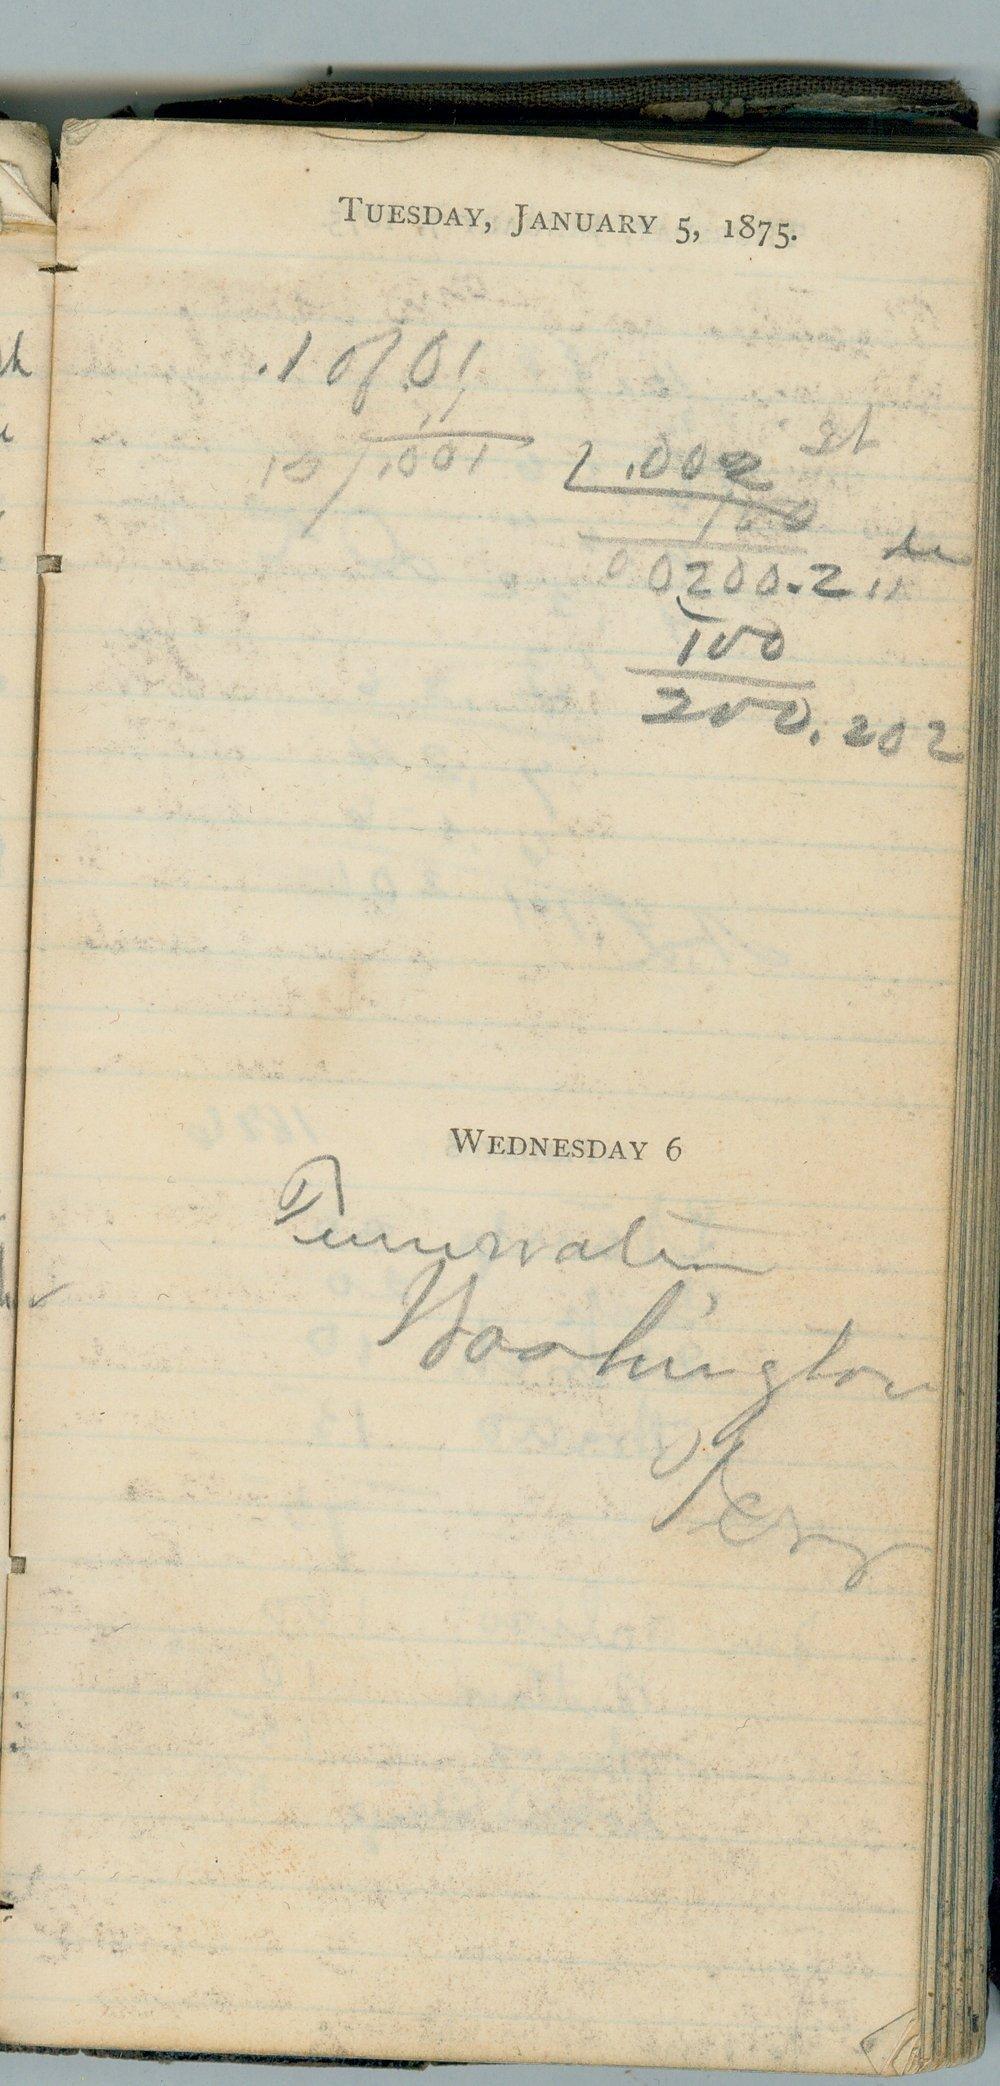 John William Gardiner diary - Jan 5, 1875